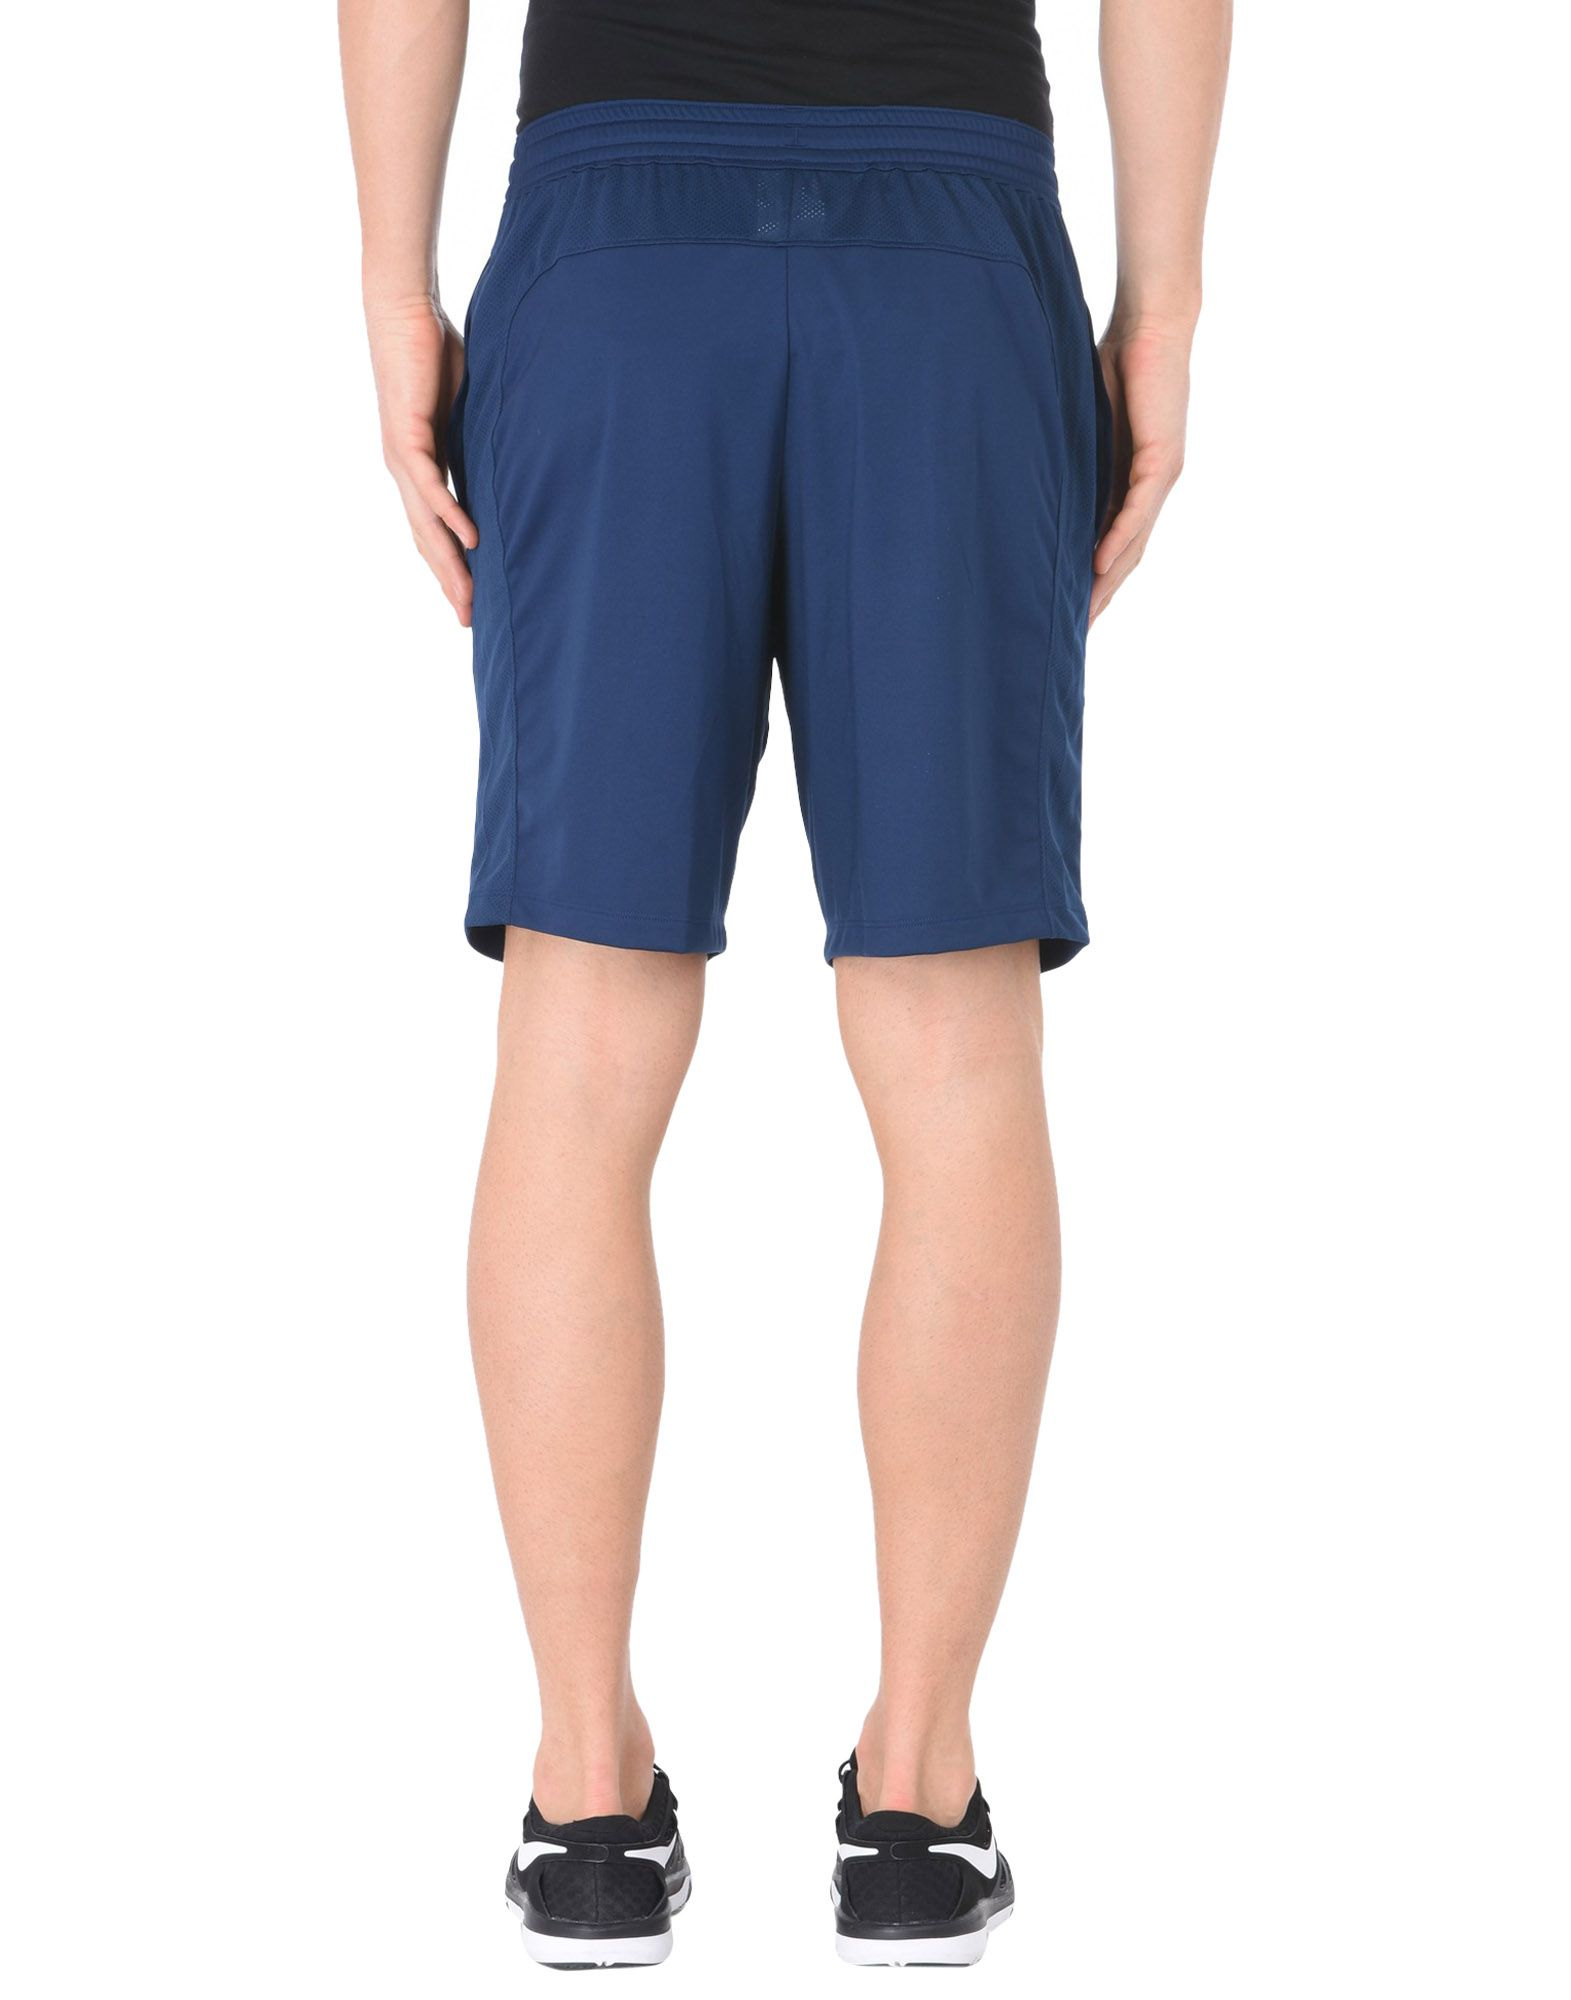 Pantalone Sportivo Under Armour Raid 2.0 2.0 Raid Short - Uomo - 13167157HO a7133d